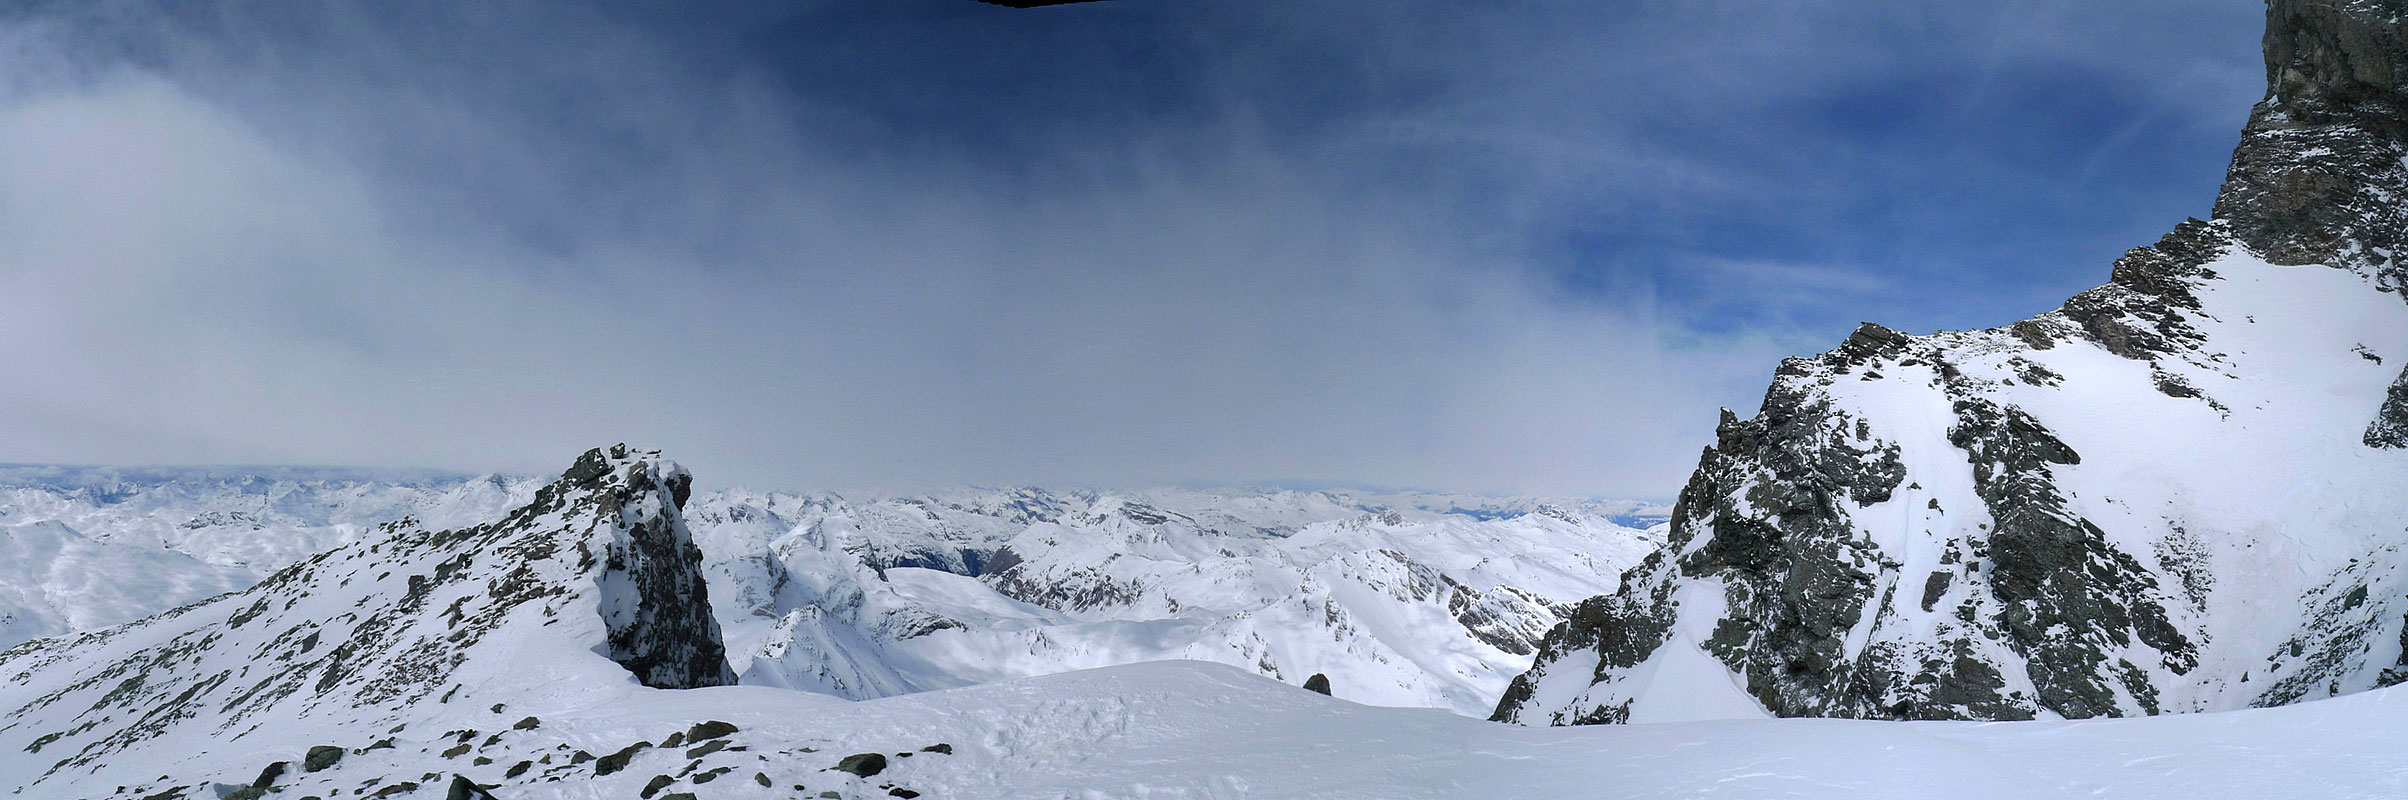 Piz Platta Plattagruppe / Oberhalbstein Switzerland panorama 29